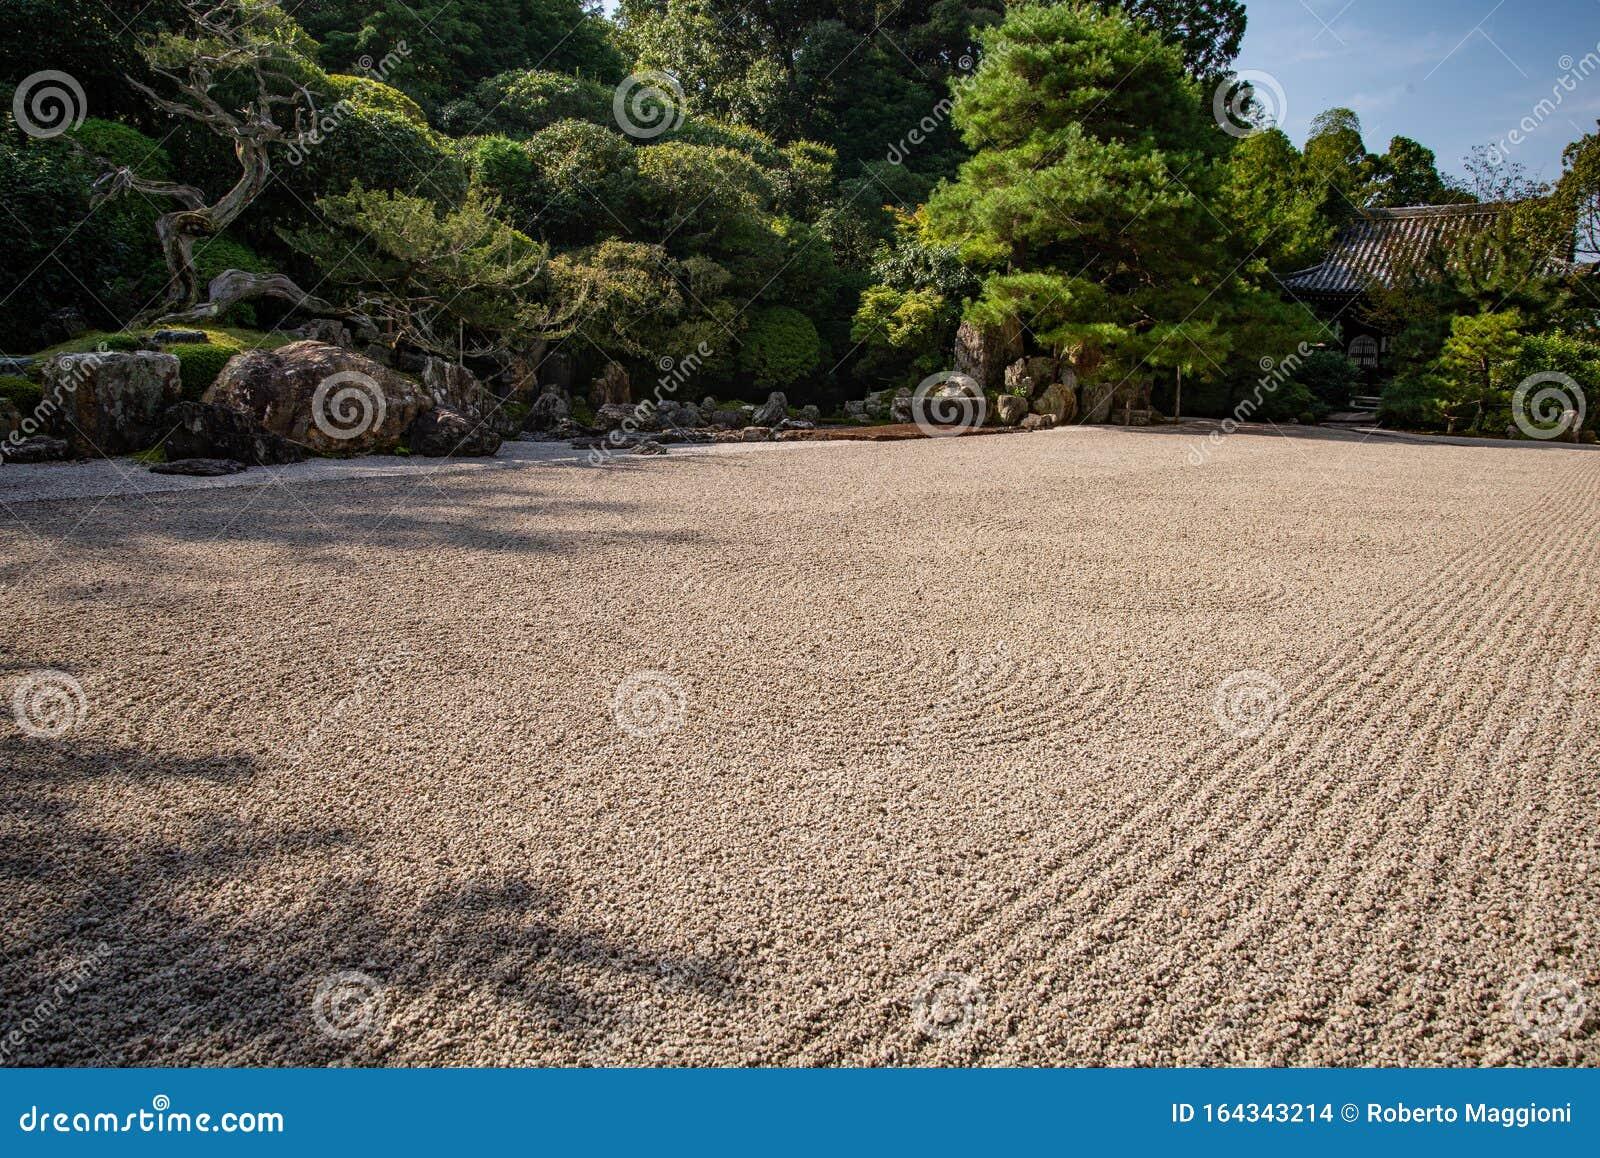 Kyoto Japan Konchi In Temple Stone Garden Stock Photo Image Of